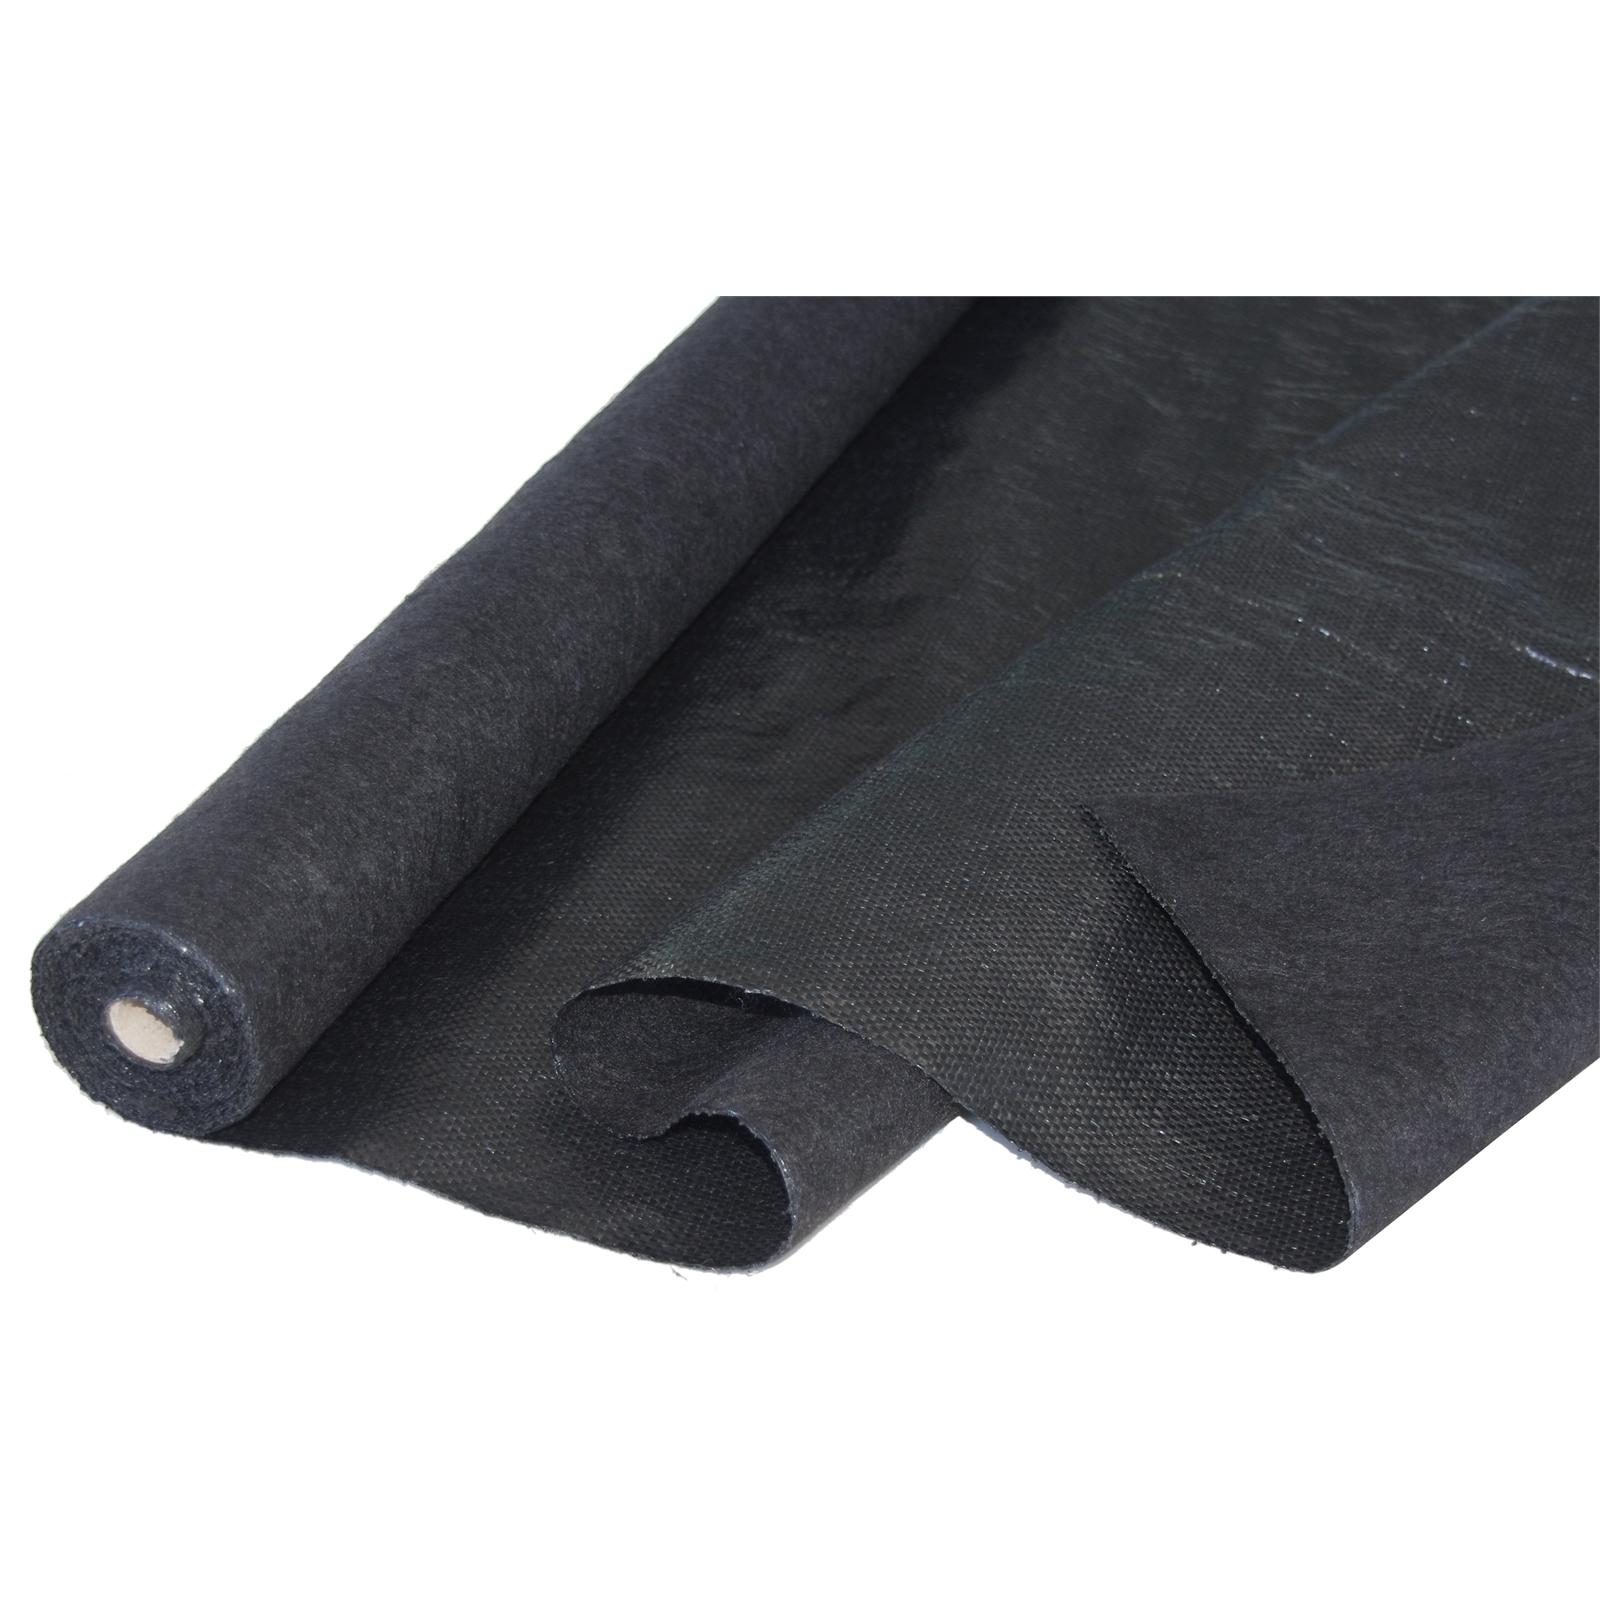 Pillar Products 1.83 x 25m Black Platinum Weed Control Mat